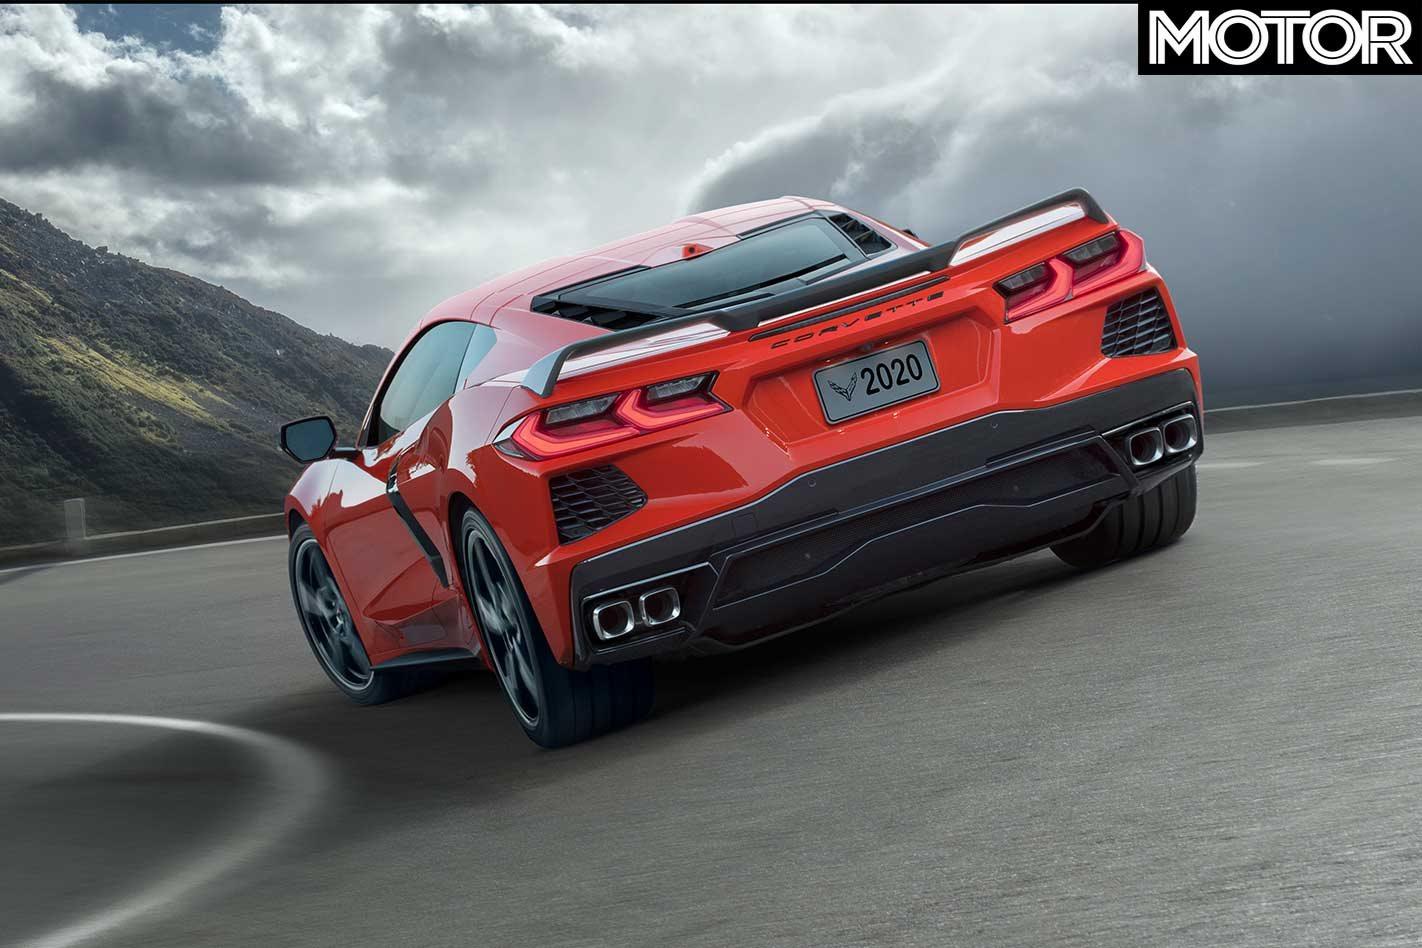 2020 Chevrolet C8 Corvette Stingray Revealed Coming To Australia